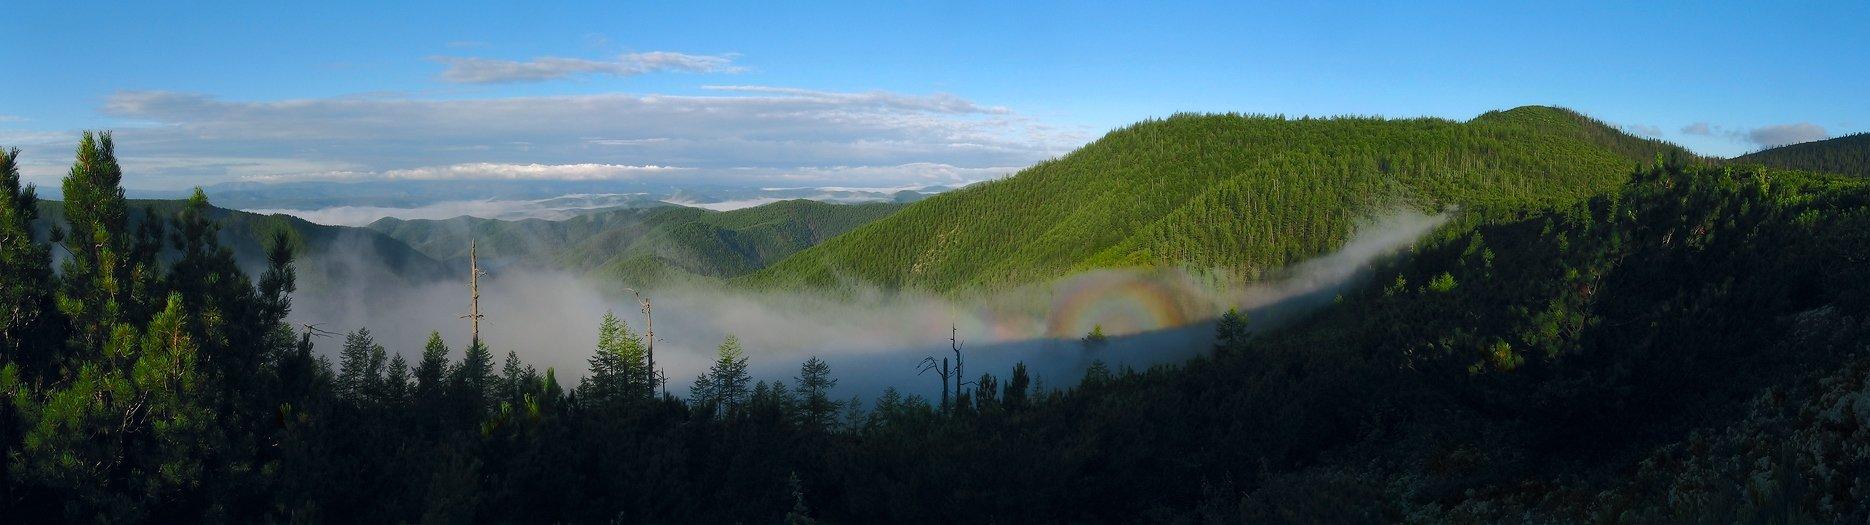 сихотэ-алинь, горы, глория, утро, туман, Alexander Gil